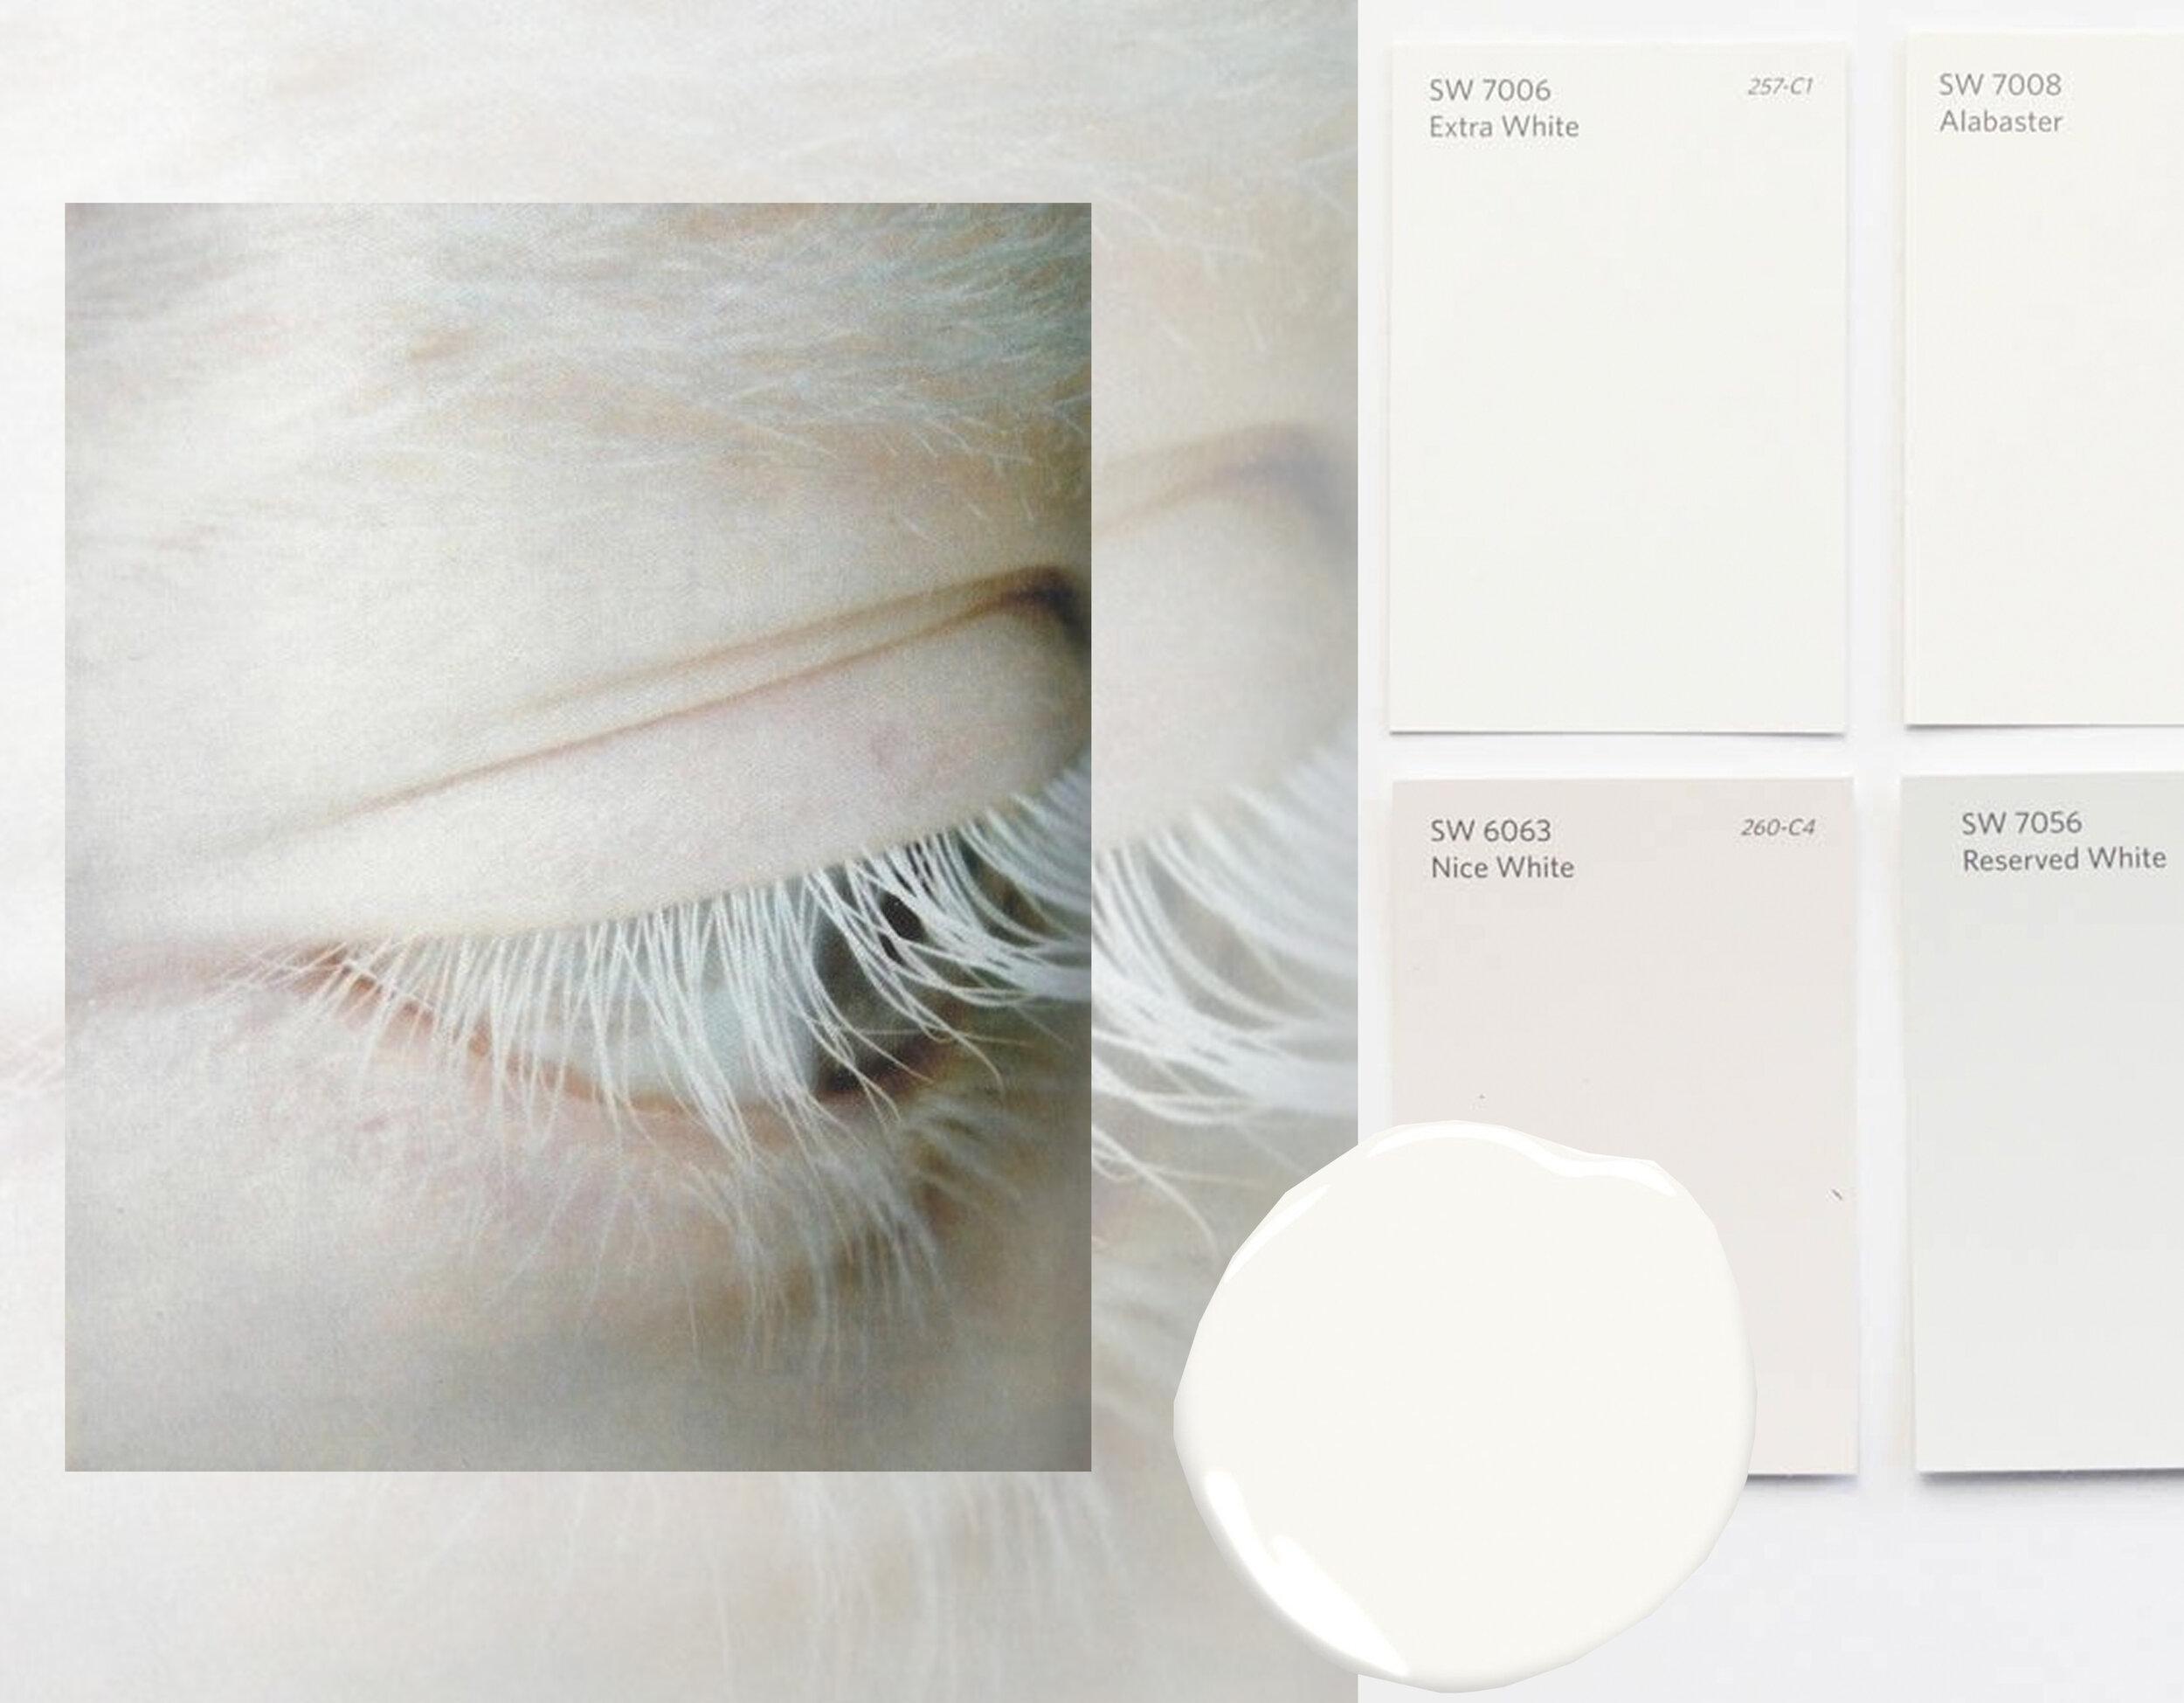 image eye via  WGSN  - paint swatches  Sherwin-Williams  via  Vintage Revivals  - Simply White  Benjamin Moore